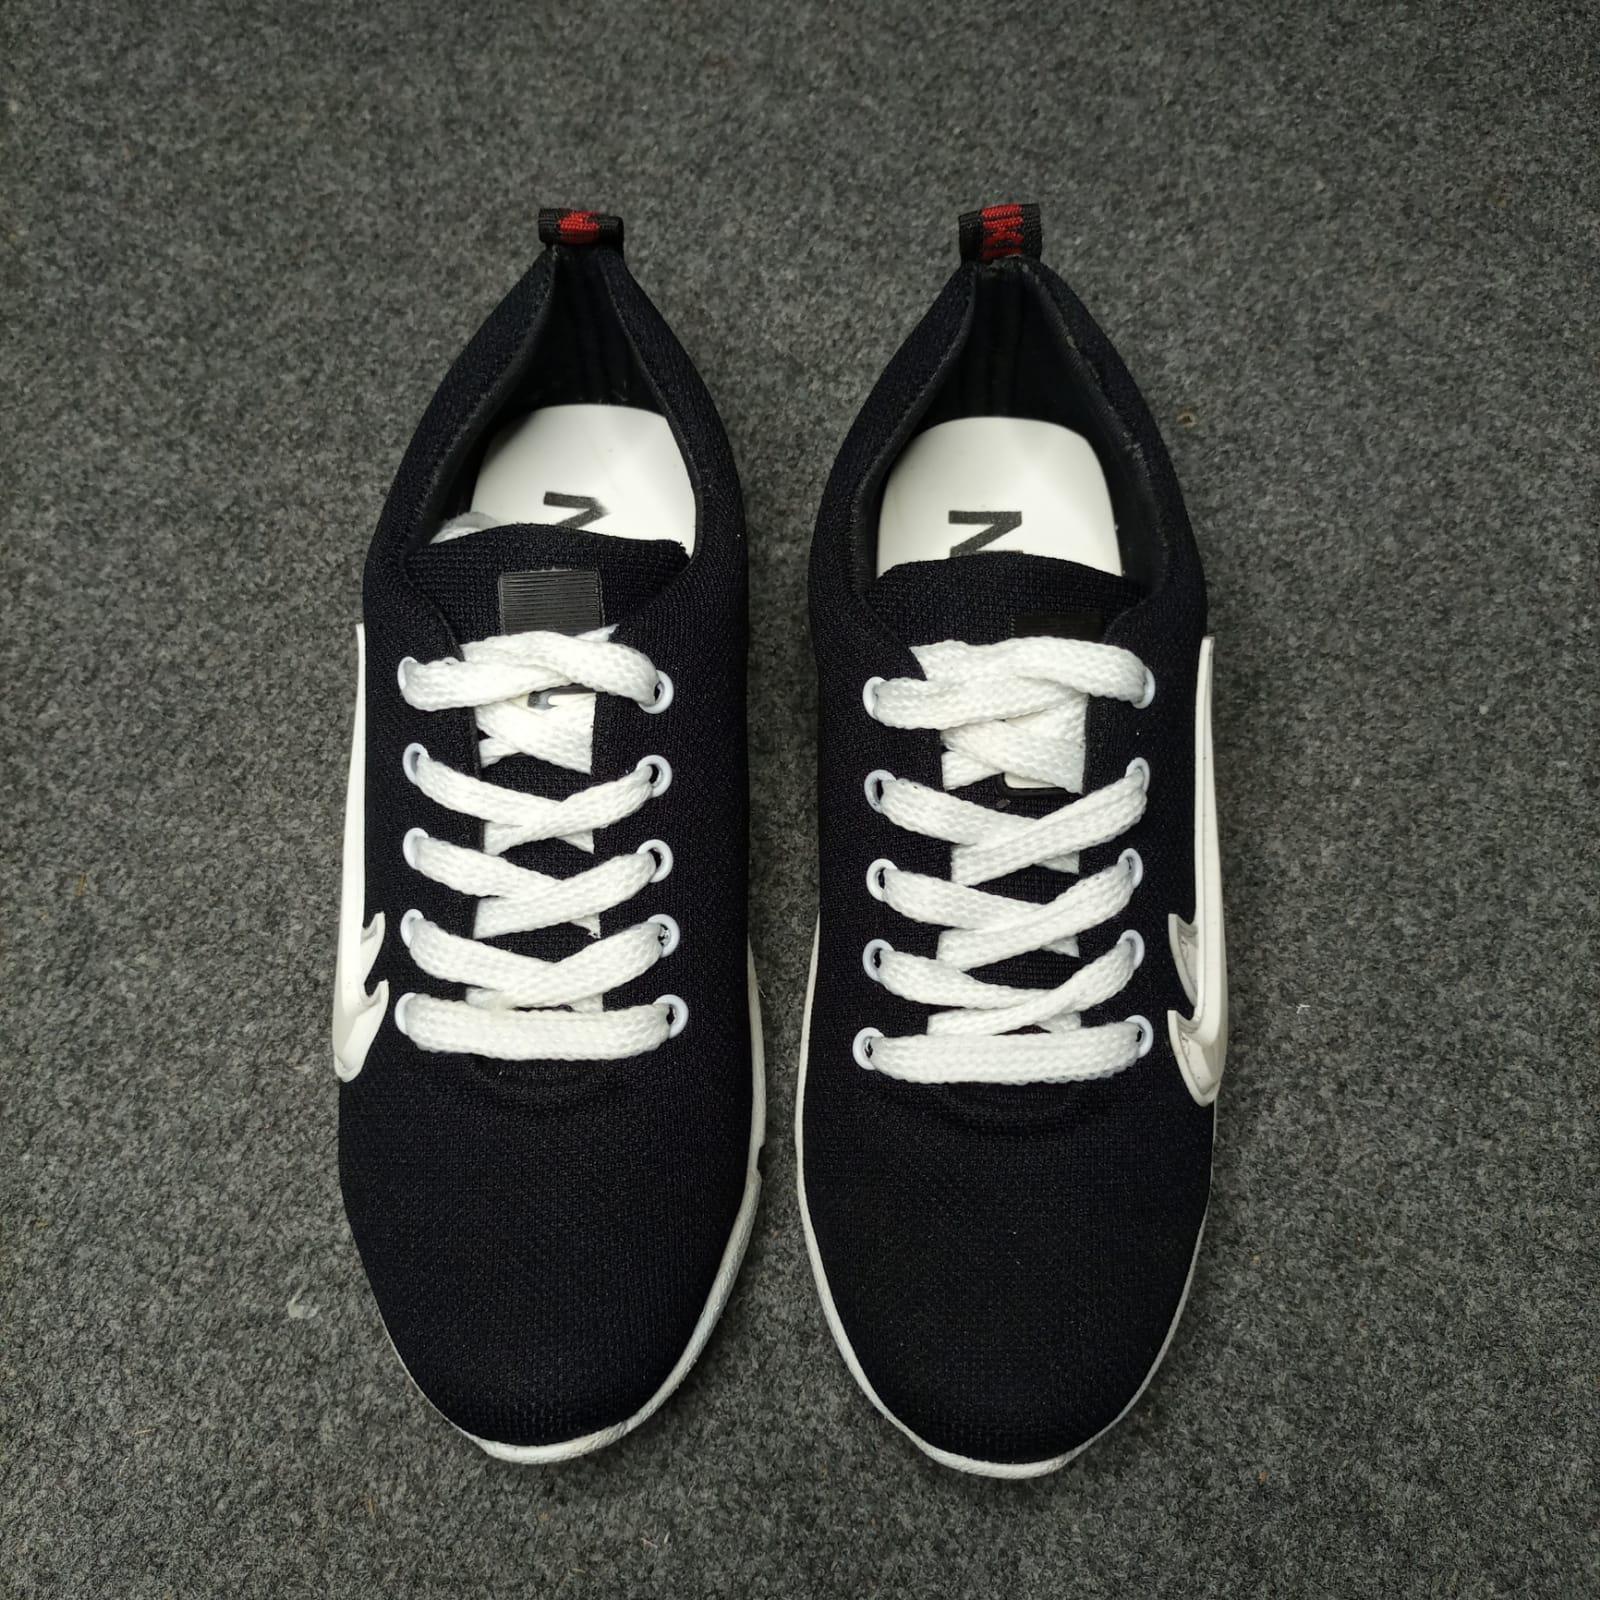 (MK) Dark Blue - Synthetic Material Sneakers for Men HOCK002